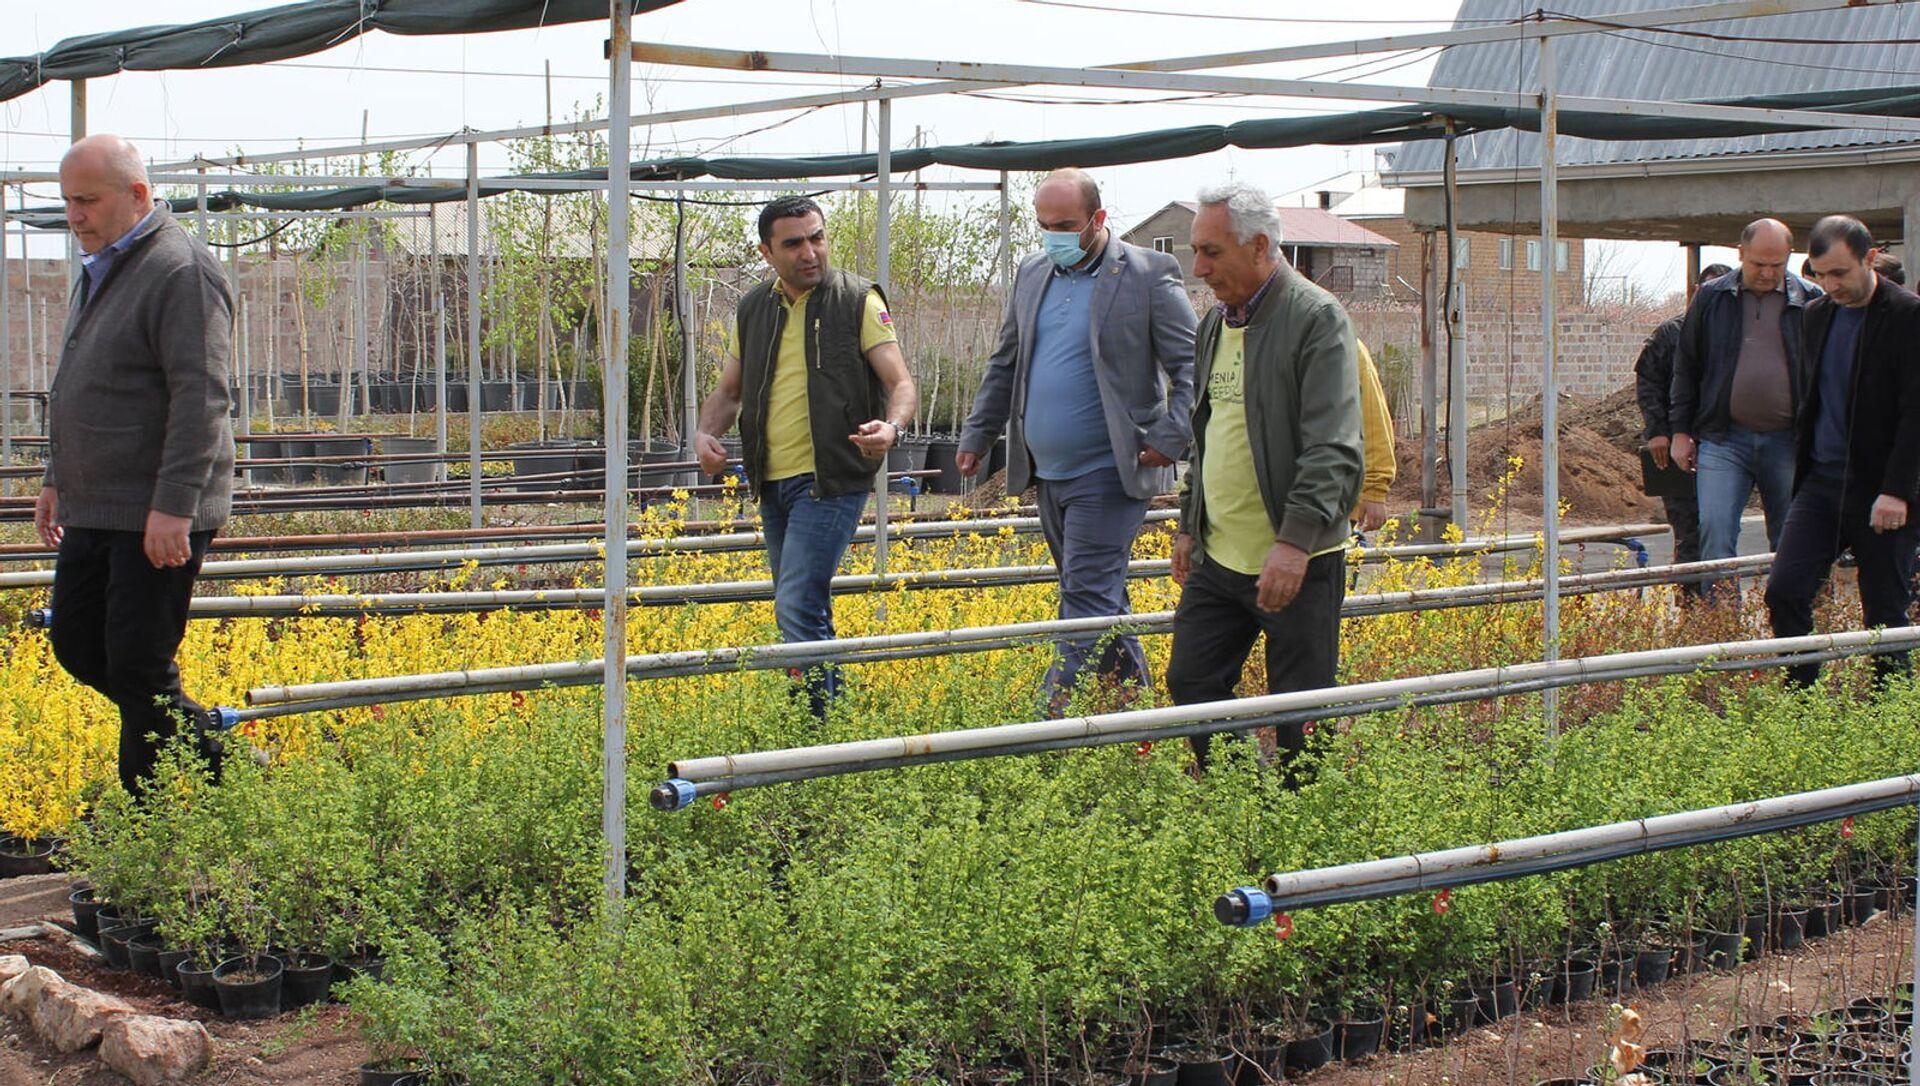 Министр окружающей среды Романос Петросян стартовал инициативу 10 миллионов деревьев (10 апреля 2021). Арагацотн - Sputnik Армения, 1920, 14.04.2021